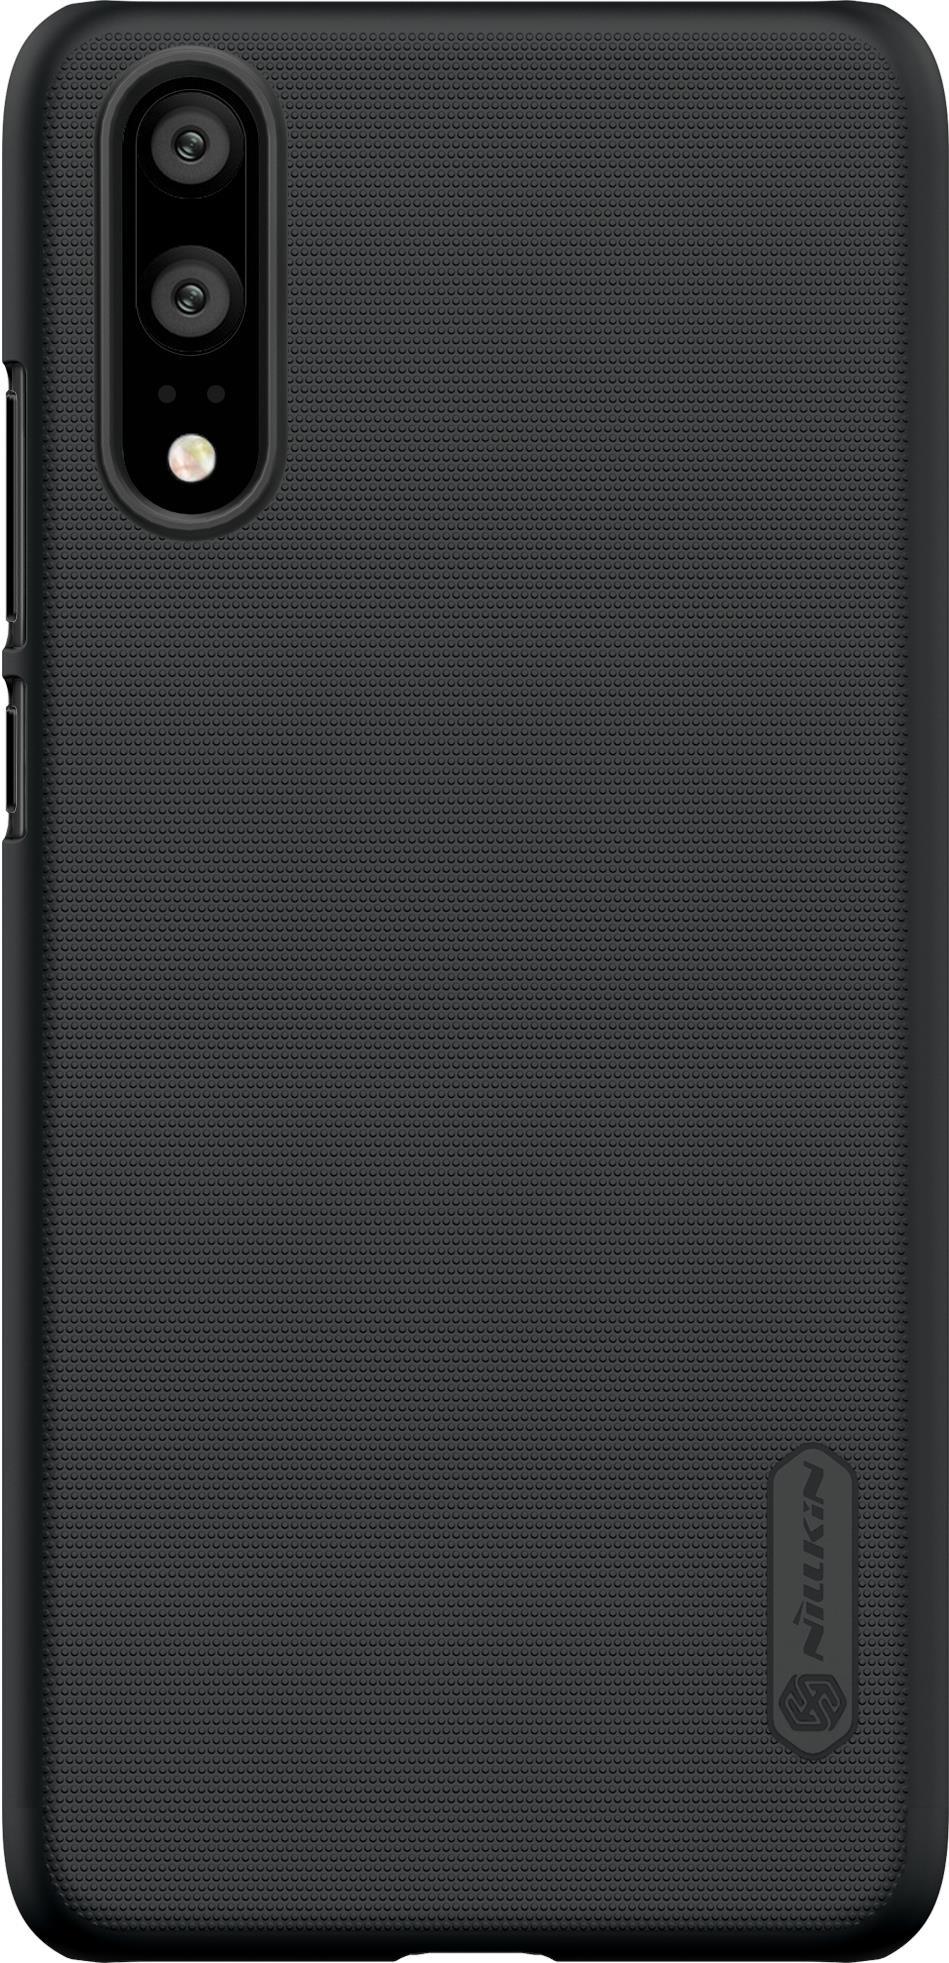 Накладка Nillkin Super Frosted для Huawei P20, 6902048155756, черный аксессуар чехол накладка huawei ascend g620 cherry white 8283